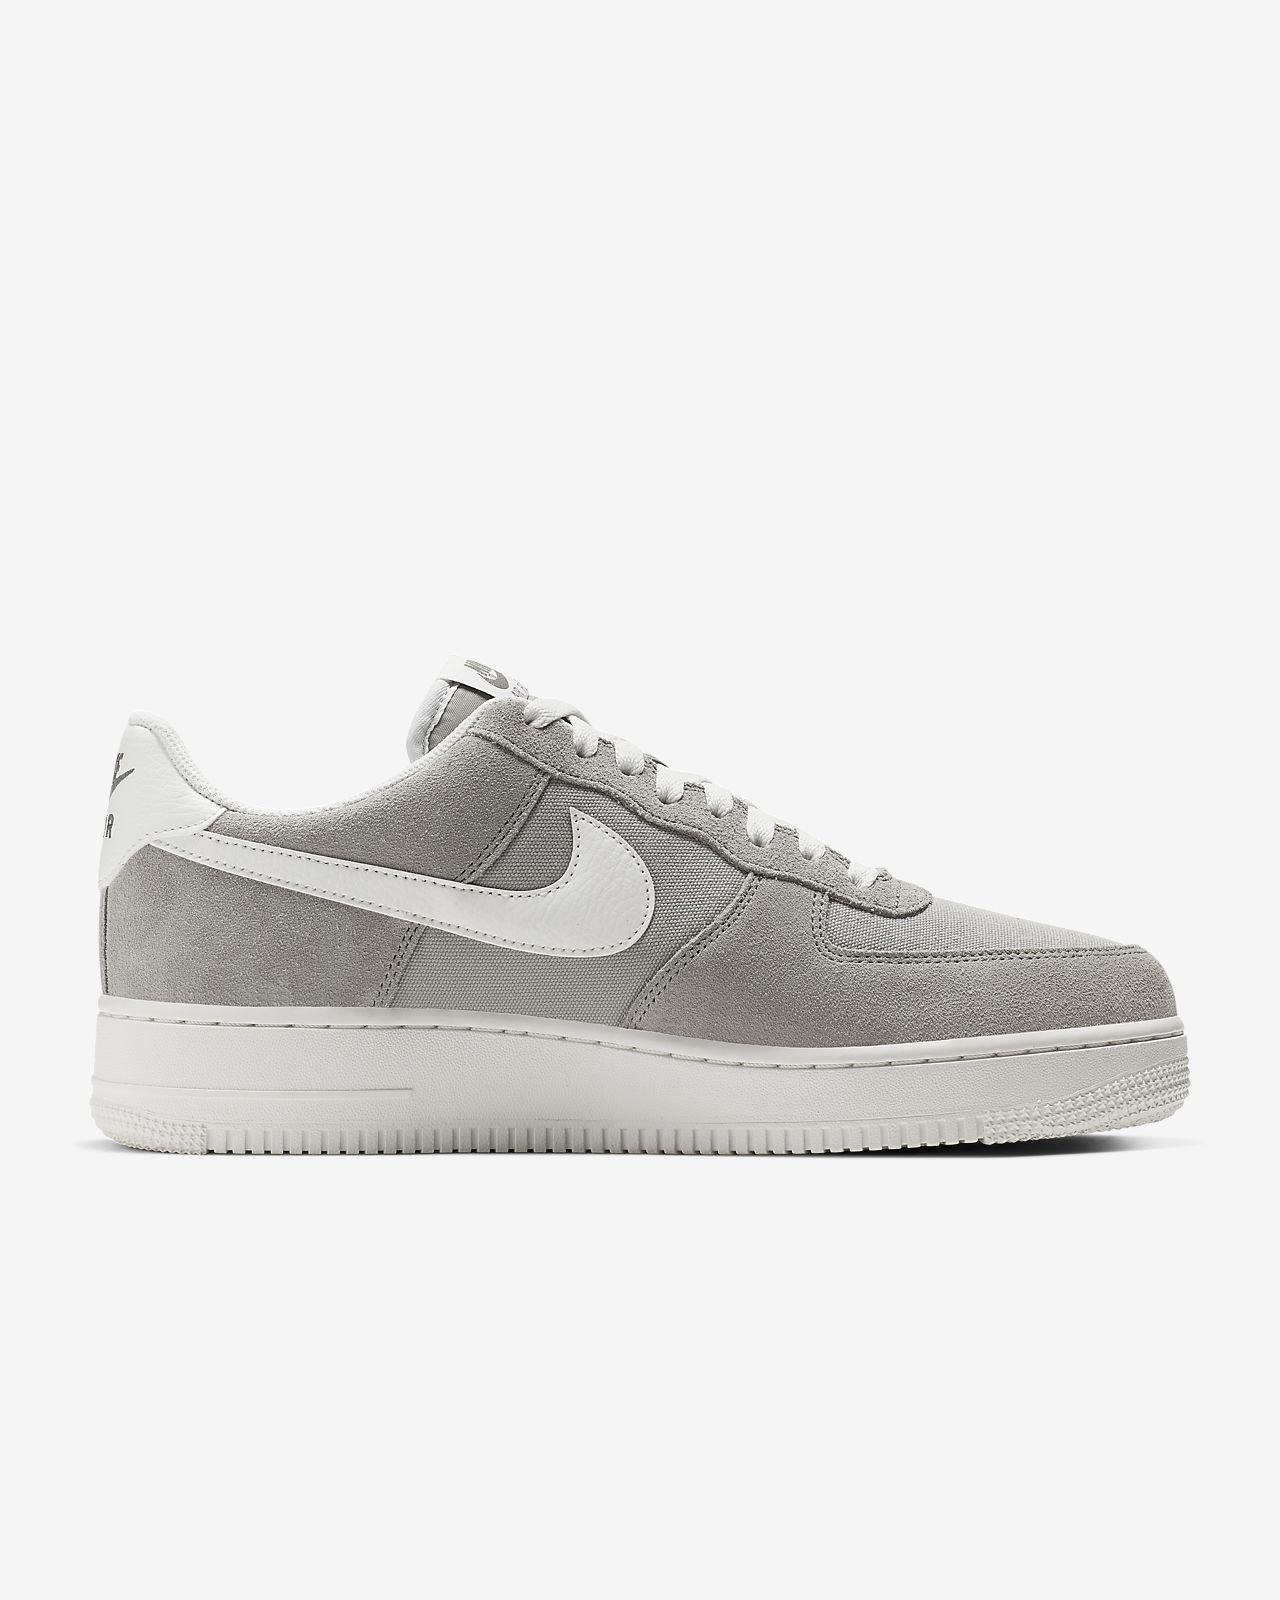 56f8bf6090 Nike Air Force 1 '07 Men's Shoe. Nike.com